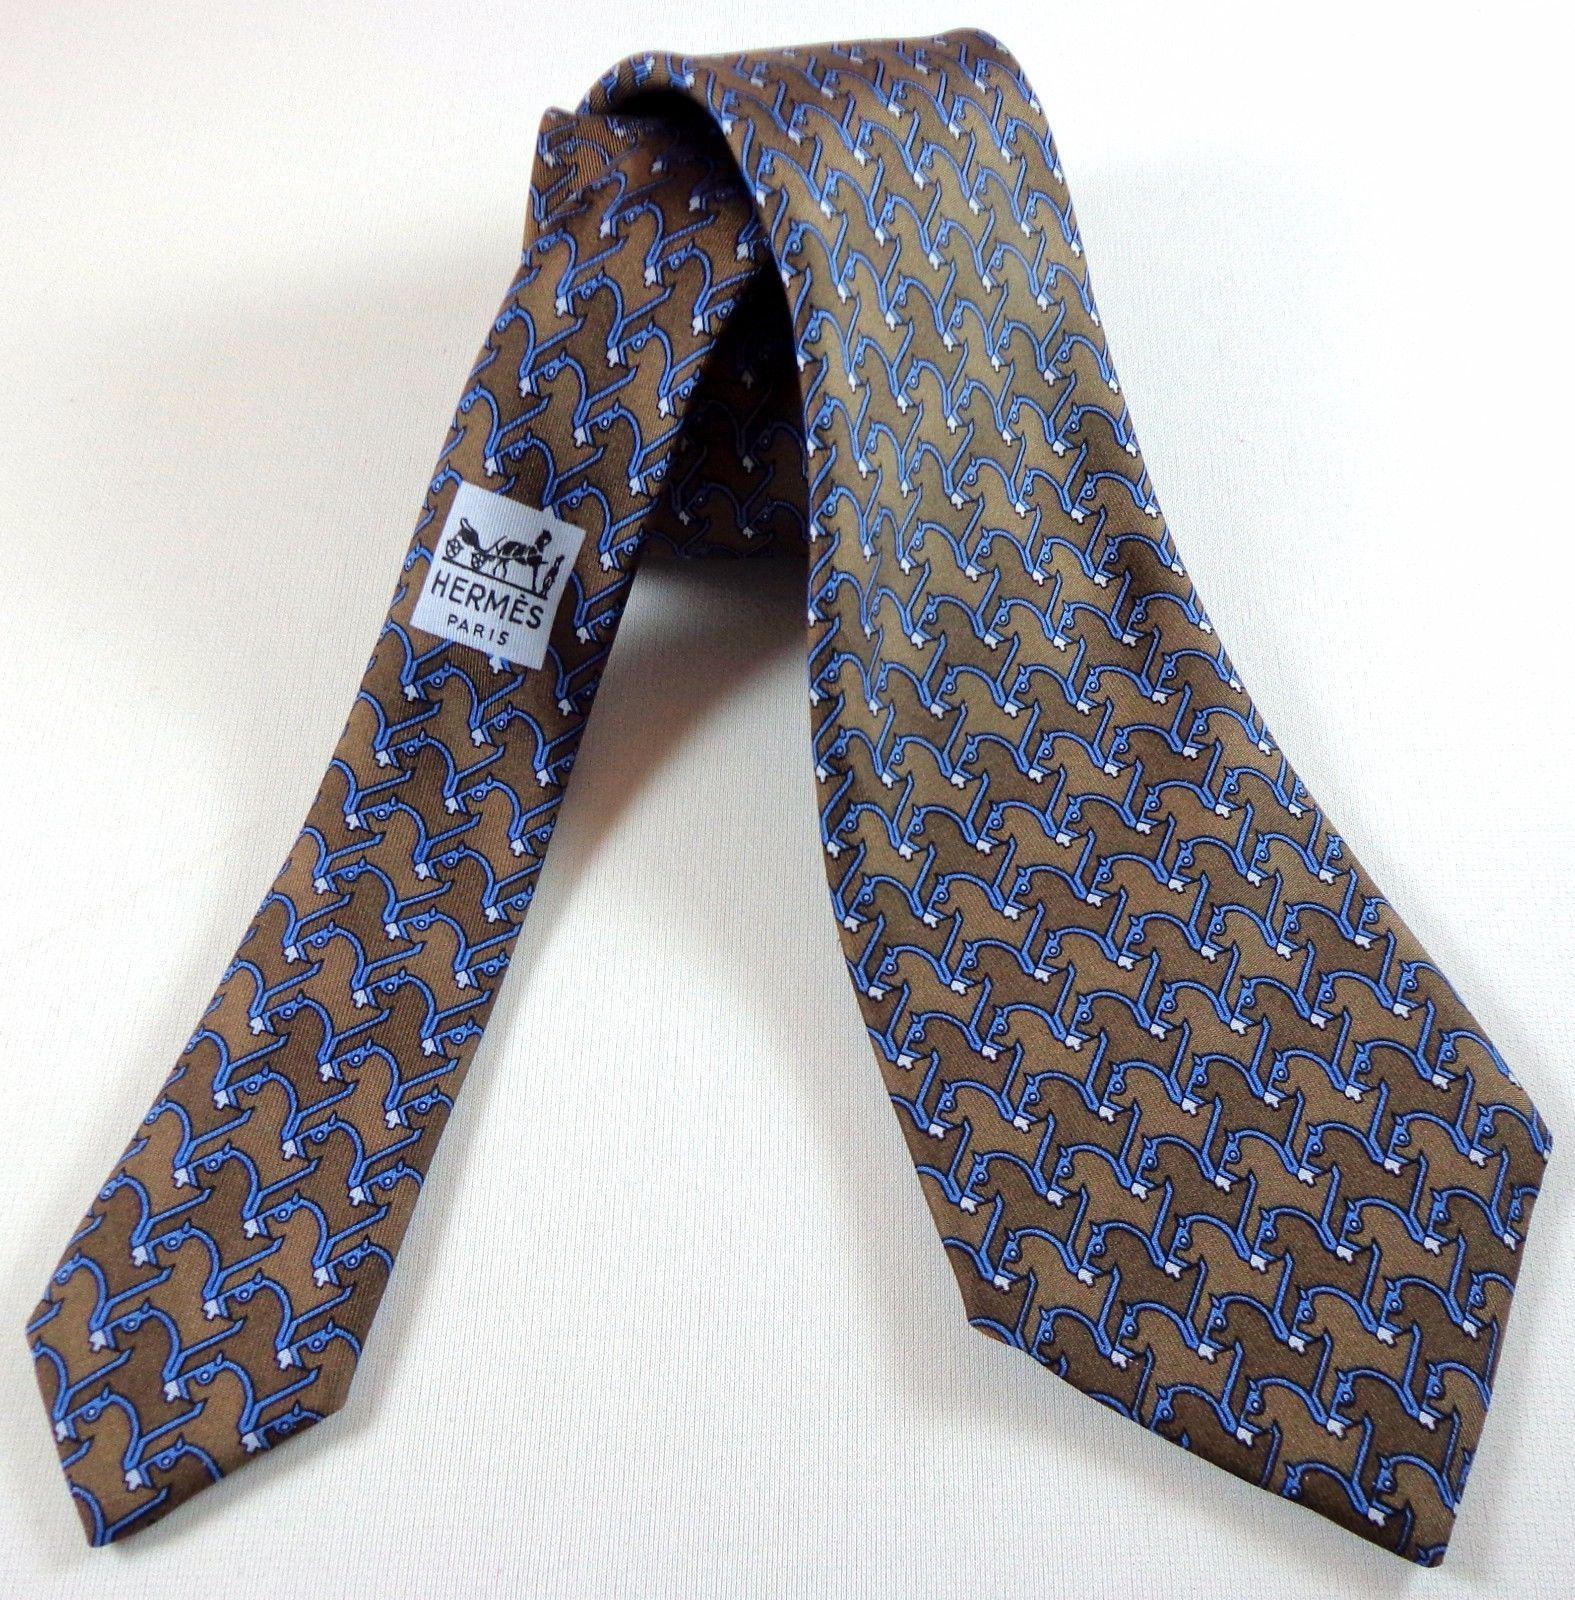 cda8e51591c3 HERMES Paris Mens Silk Necktie 877 PA Horse and similar items. 57